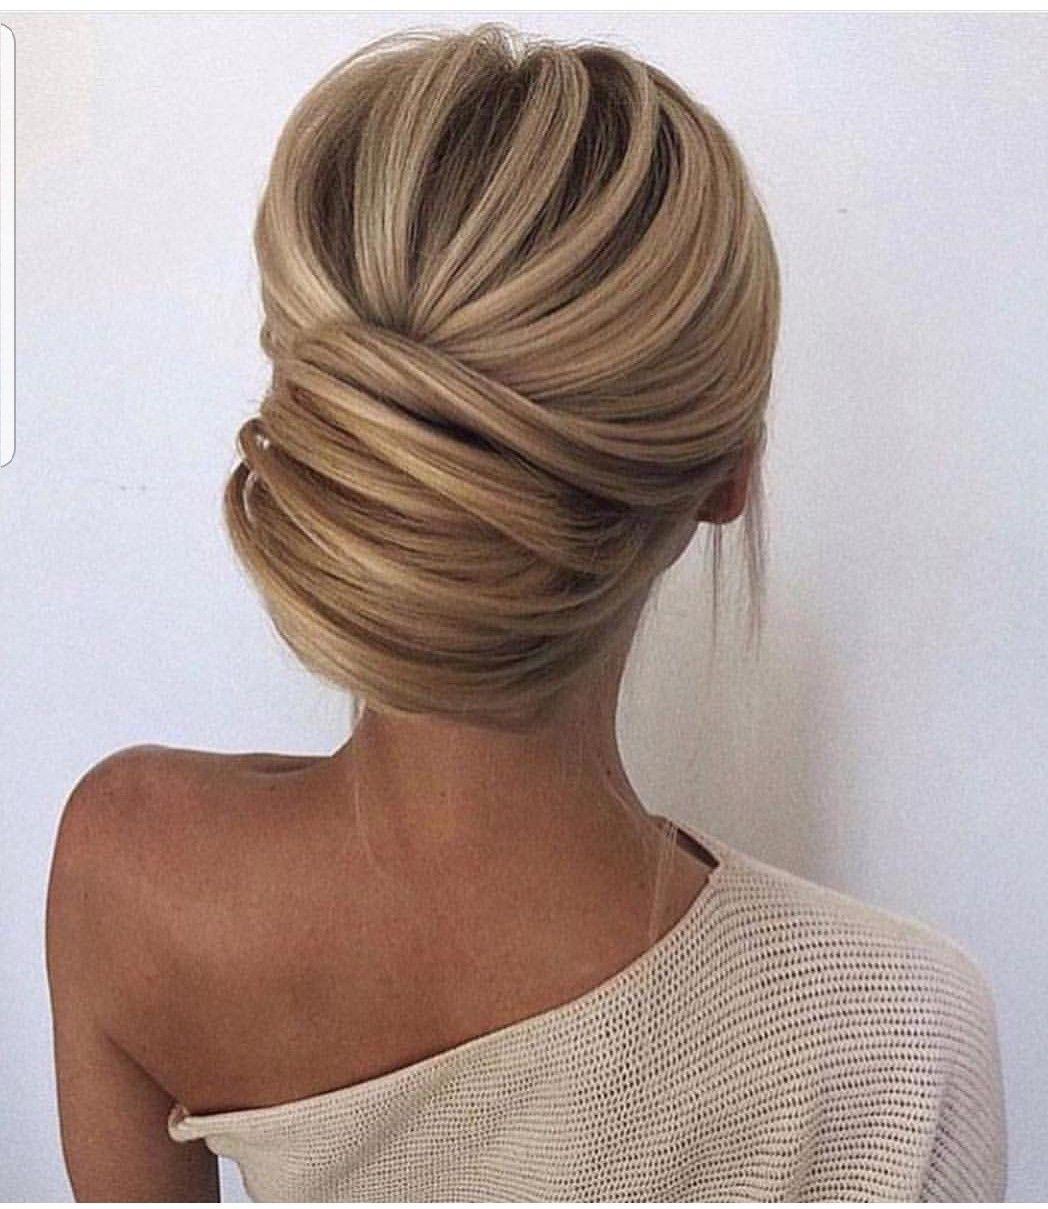 Pin By Mackenzie Vanderfeltz On Beauty Hair Styles Long Hair Styles Hairstyles For Thin Hair